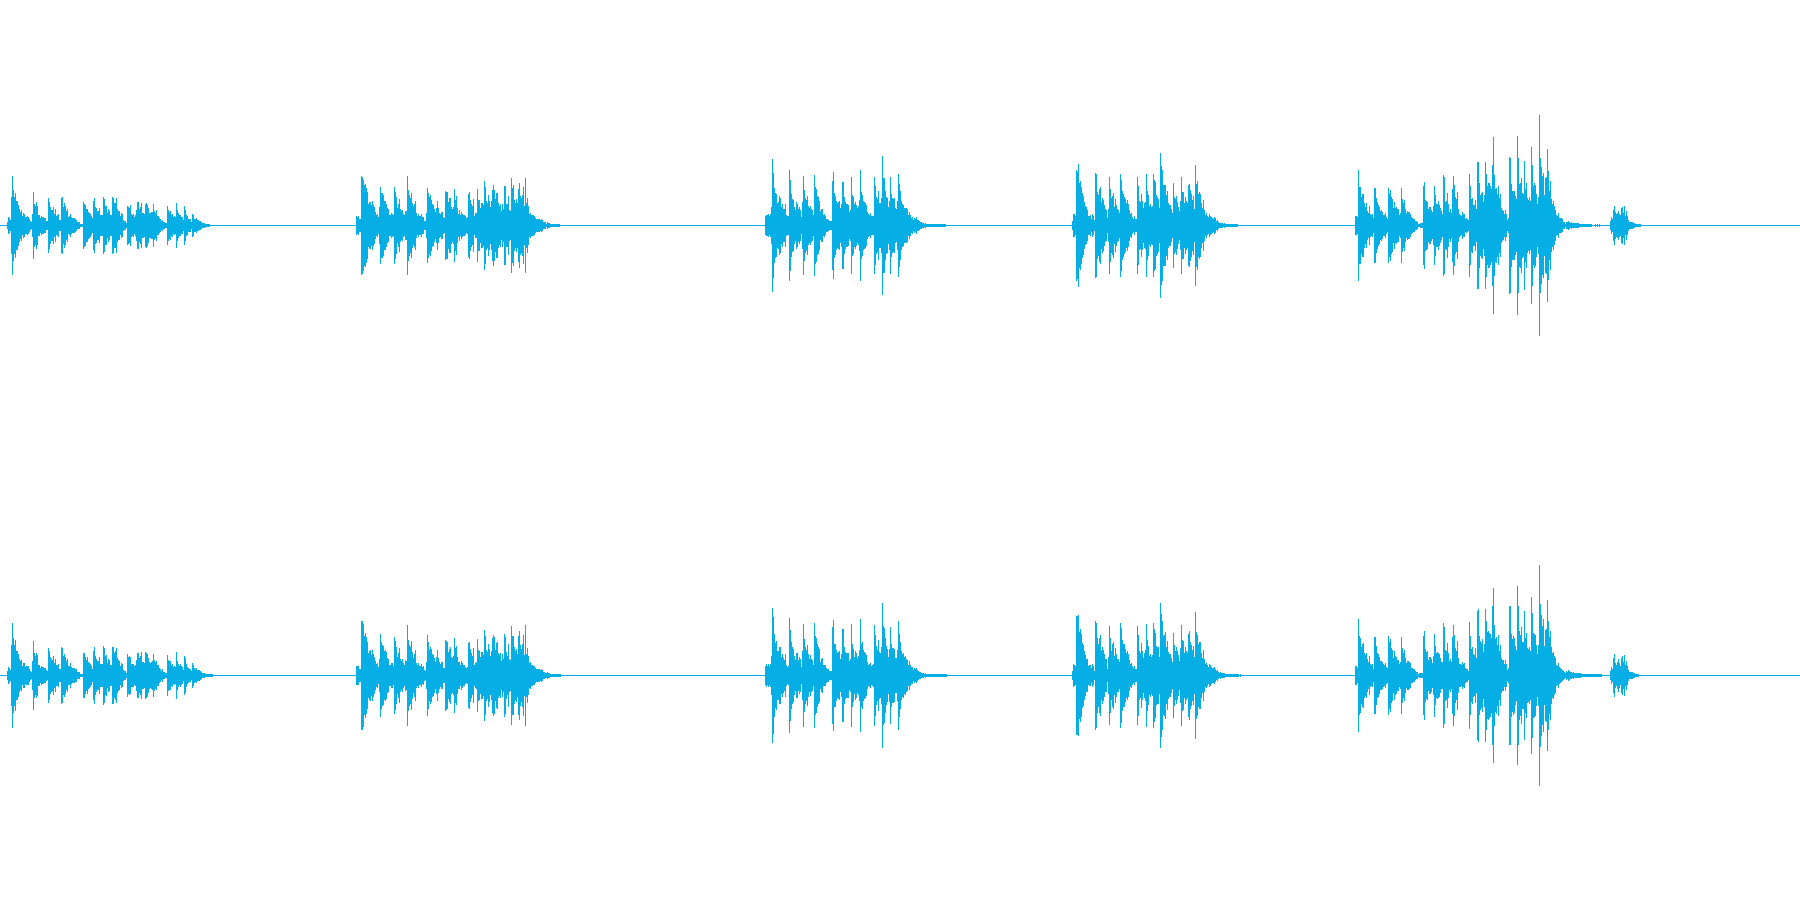 大太鼓5ウス風音歌舞伎情景描写和風和太鼓の再生済みの波形